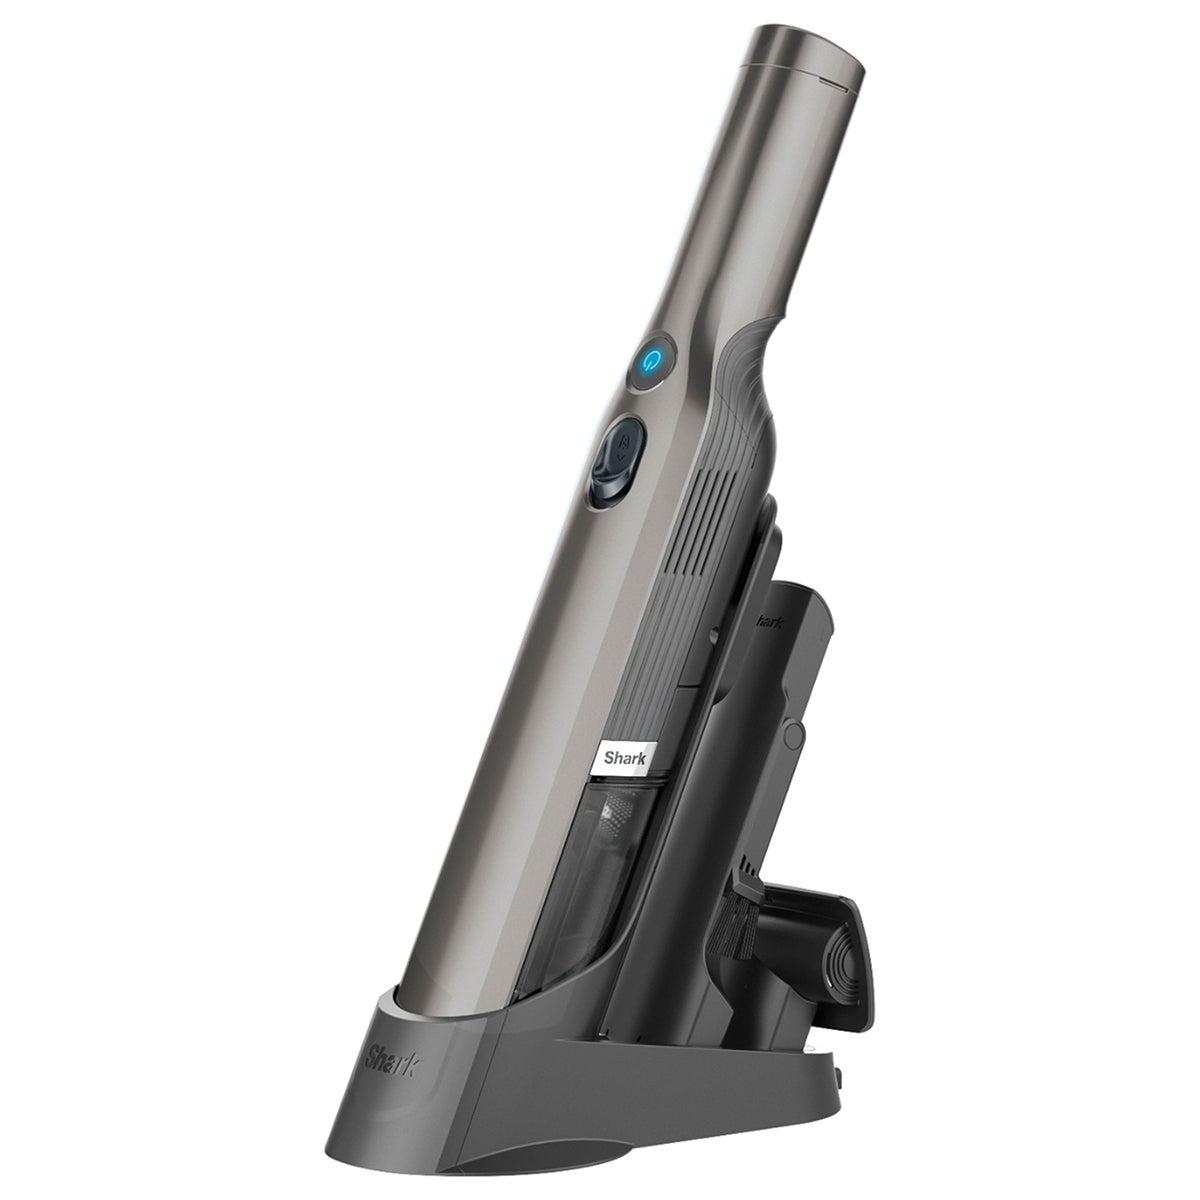 Shark WANDVAC Cord-Free Handheld Vacuum